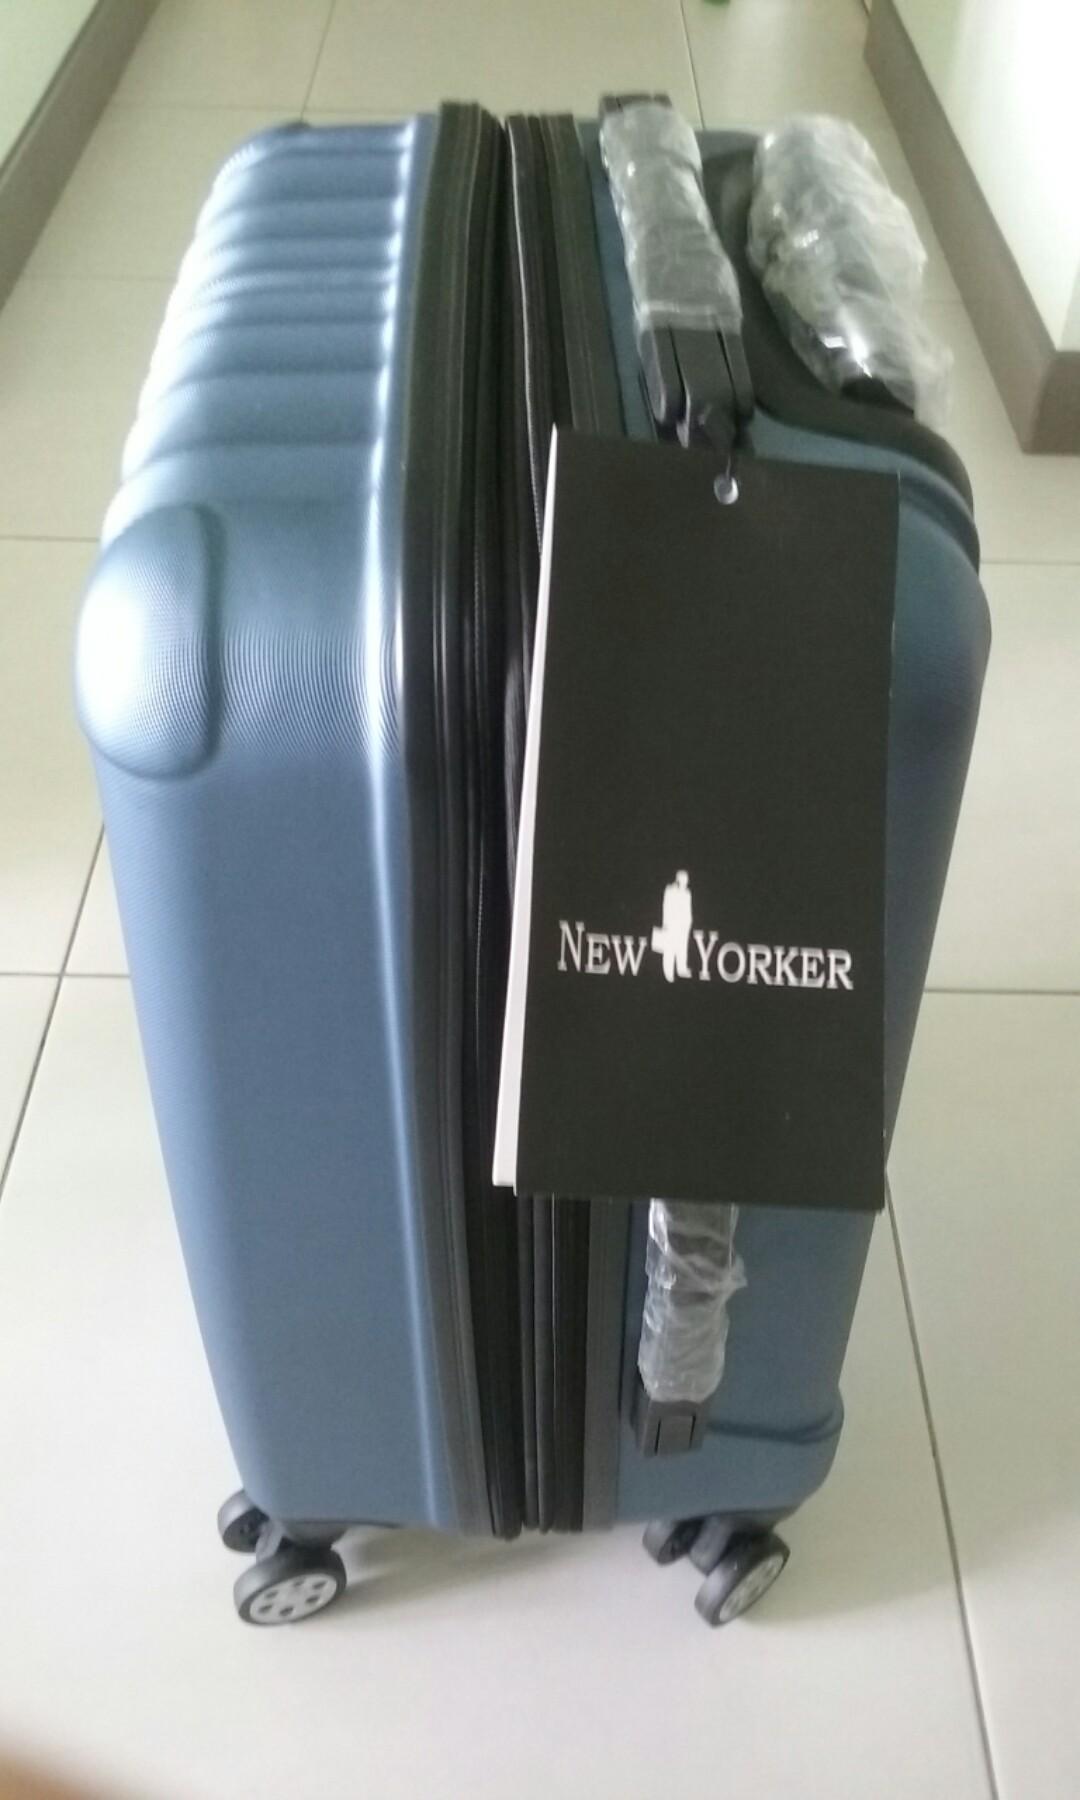 7951088b367511 IDoTrades New Yorker 20 Inch luggage with TSA lock